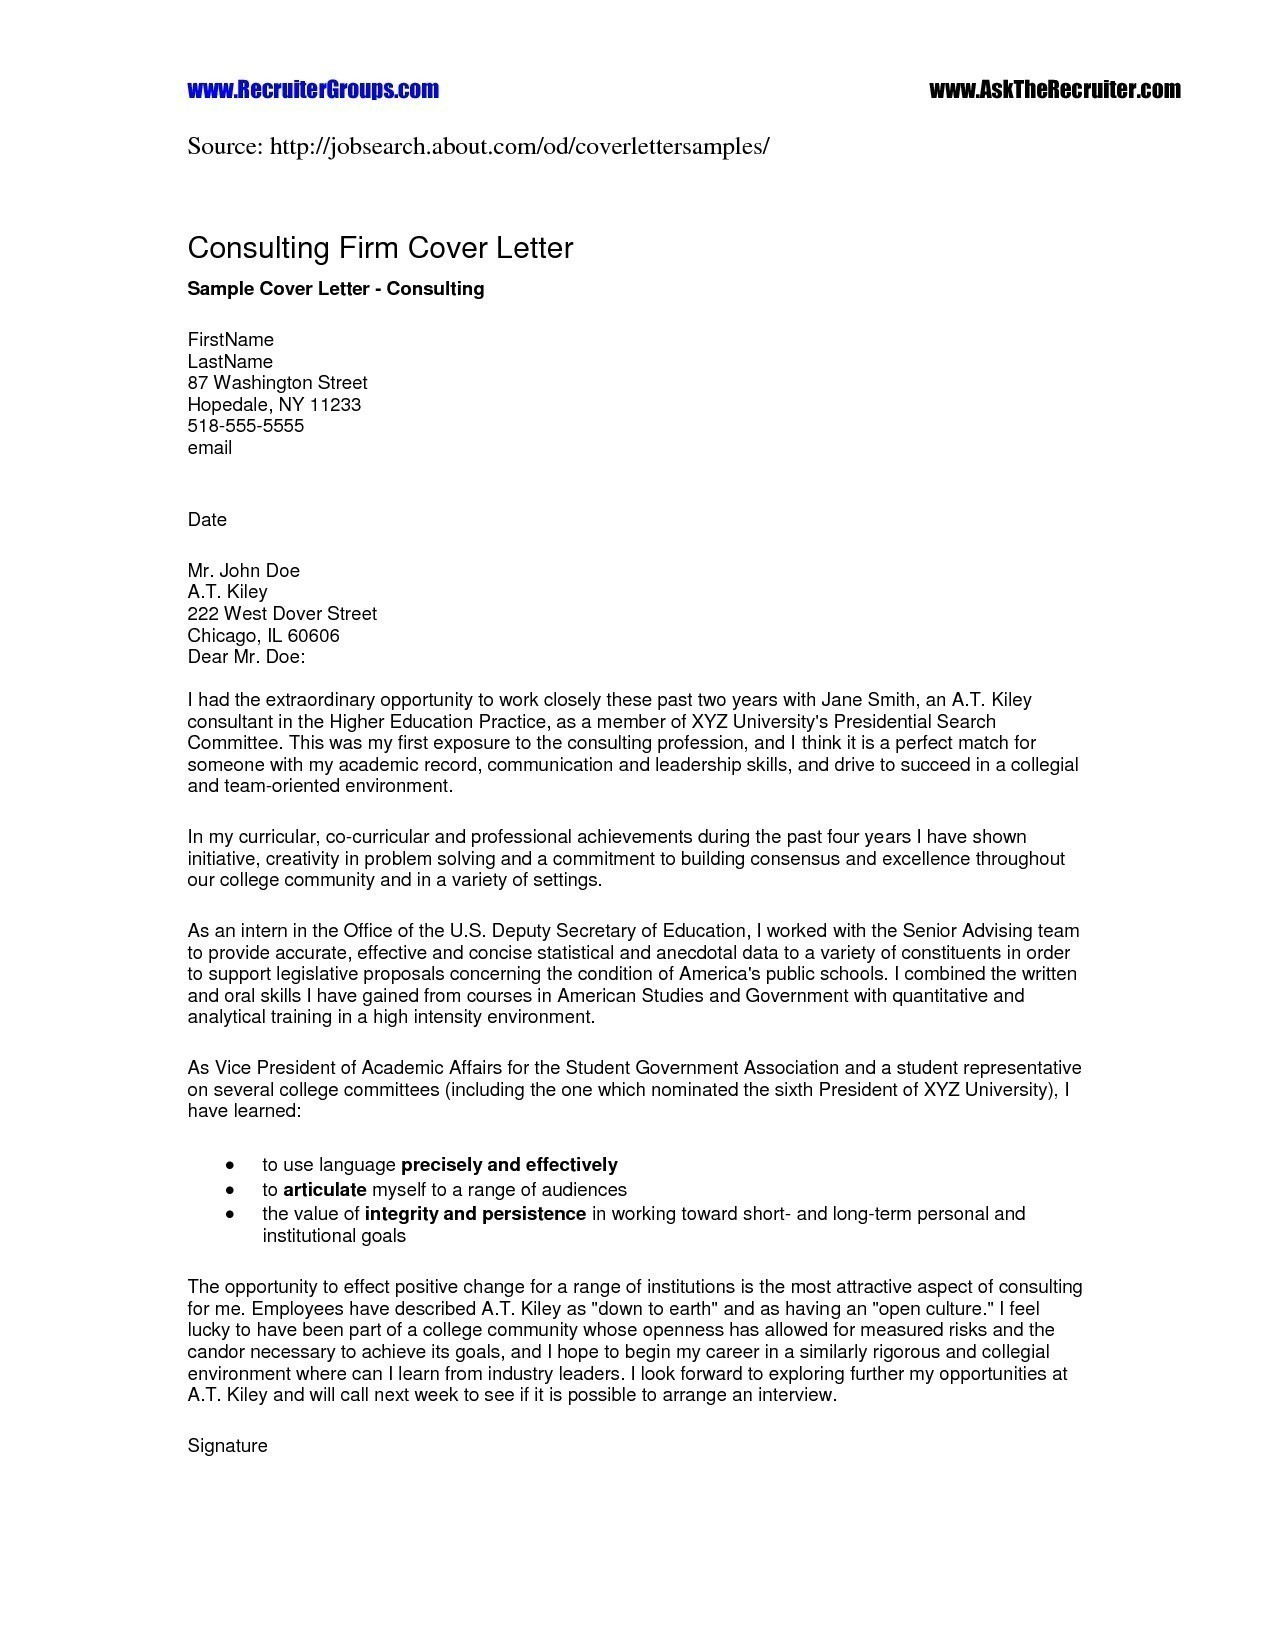 Job Offer Letter Template - Job Fer Letter Sample Best Job Fer Letter Template Us Copy Od